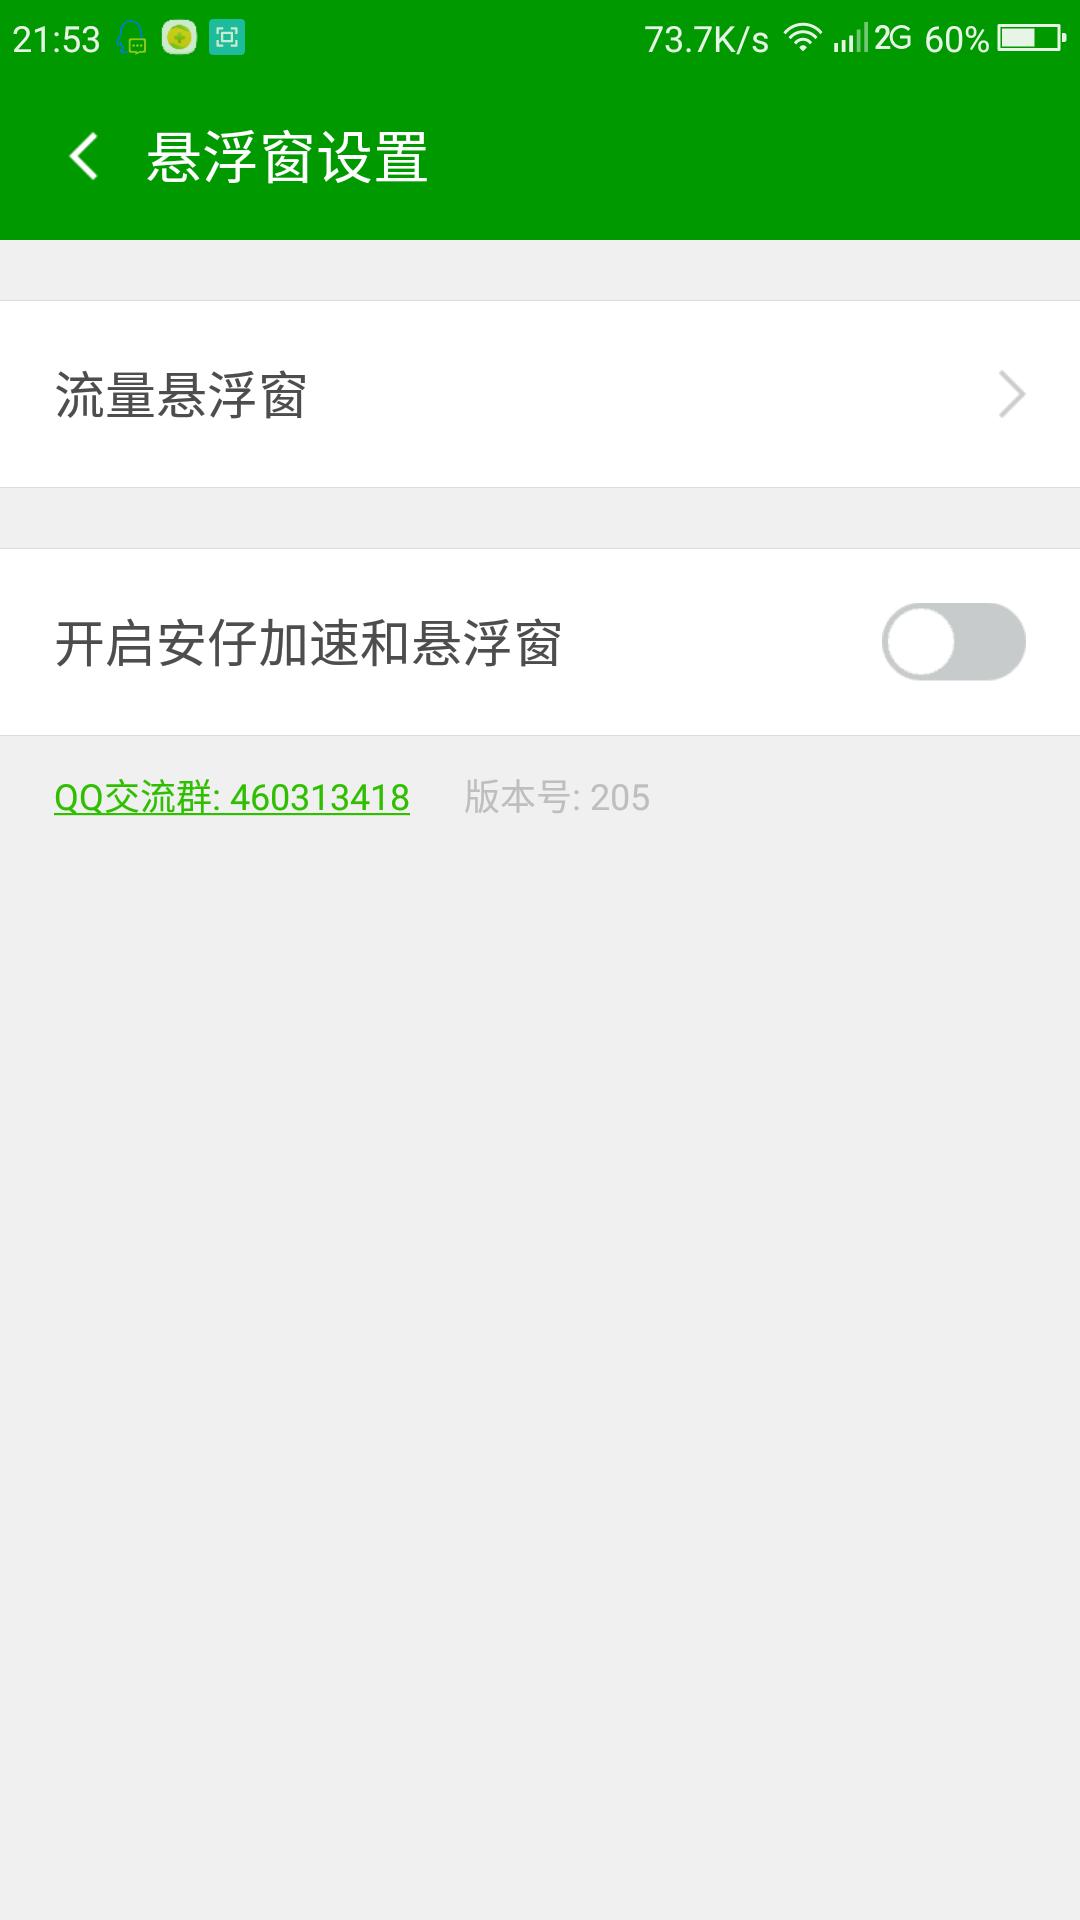 Screenshot_2018-01-22-21-53-56.png